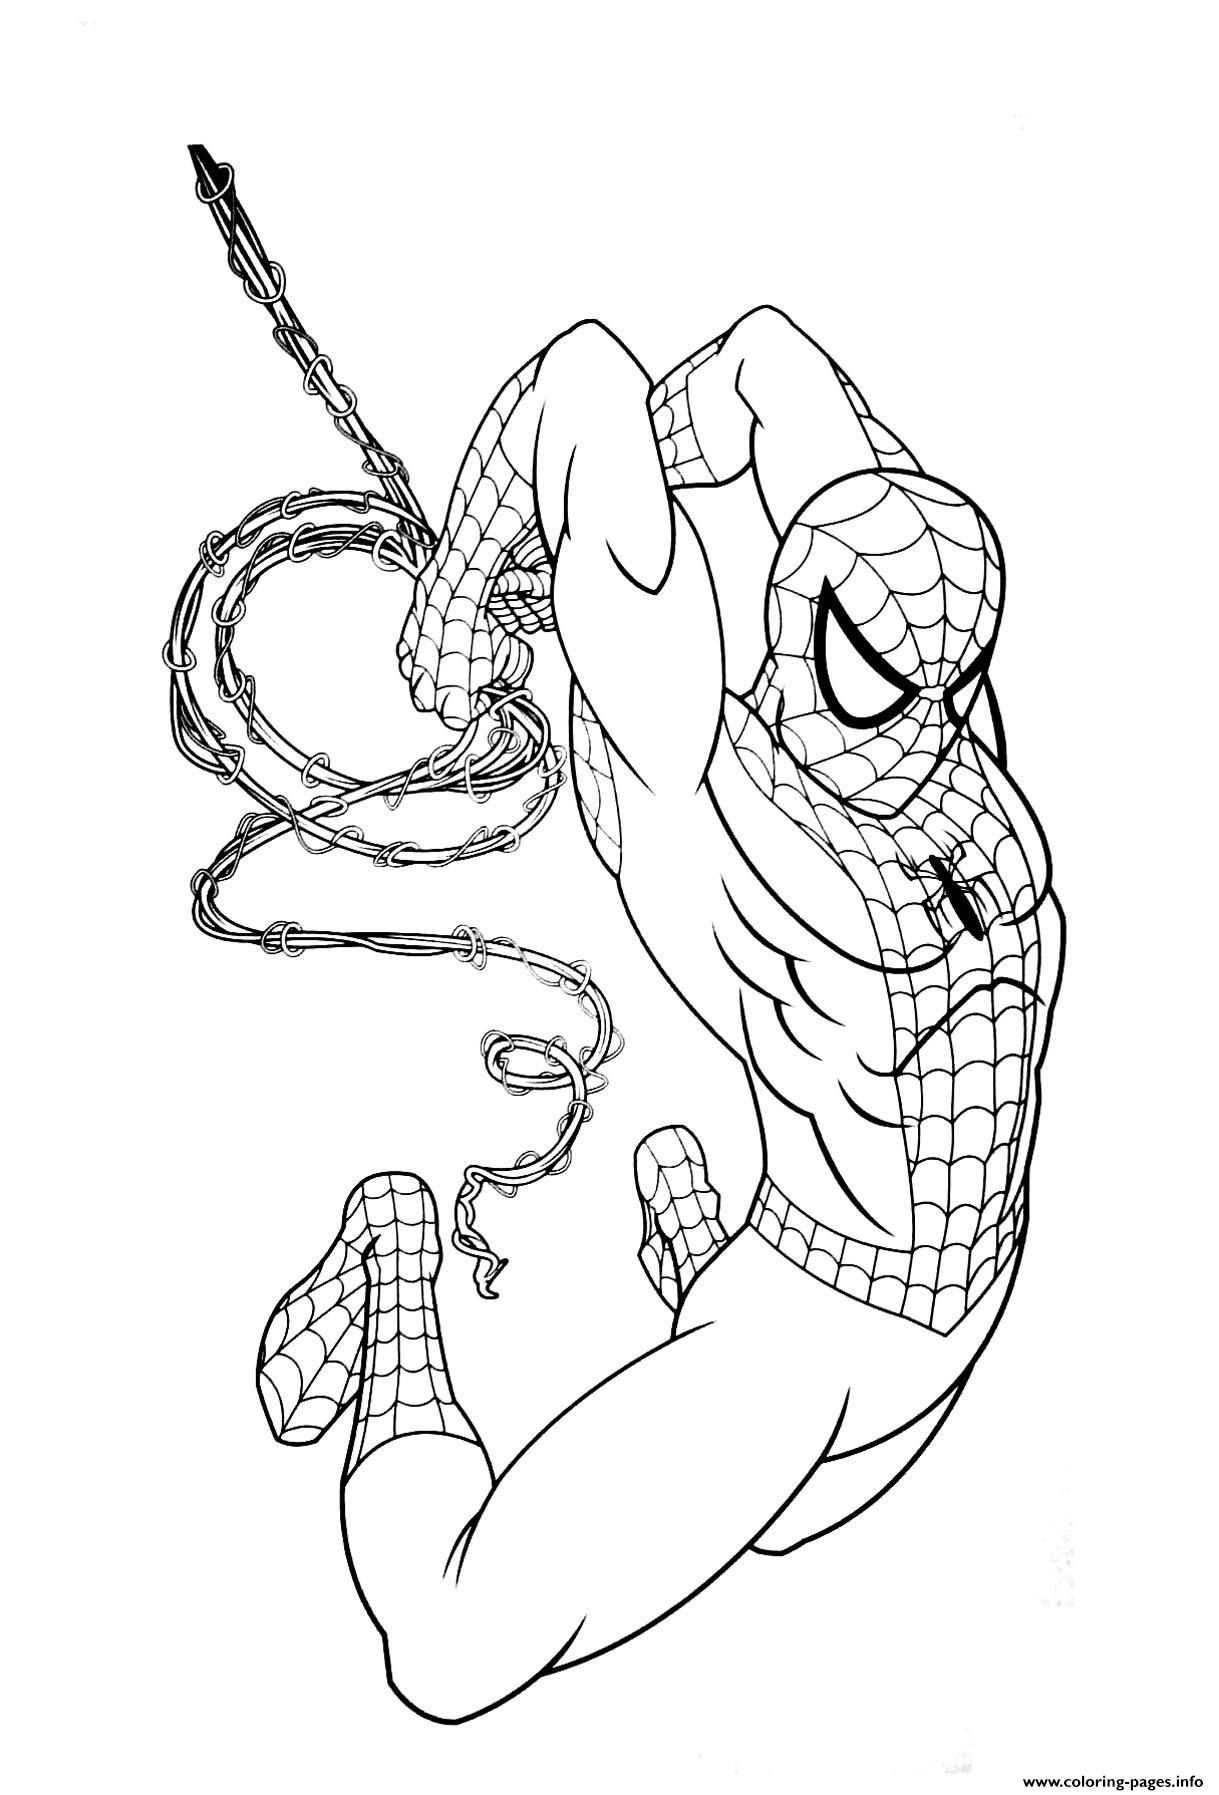 Print Avengers Endgame Spiderman Coloring Pages Kleurplaten